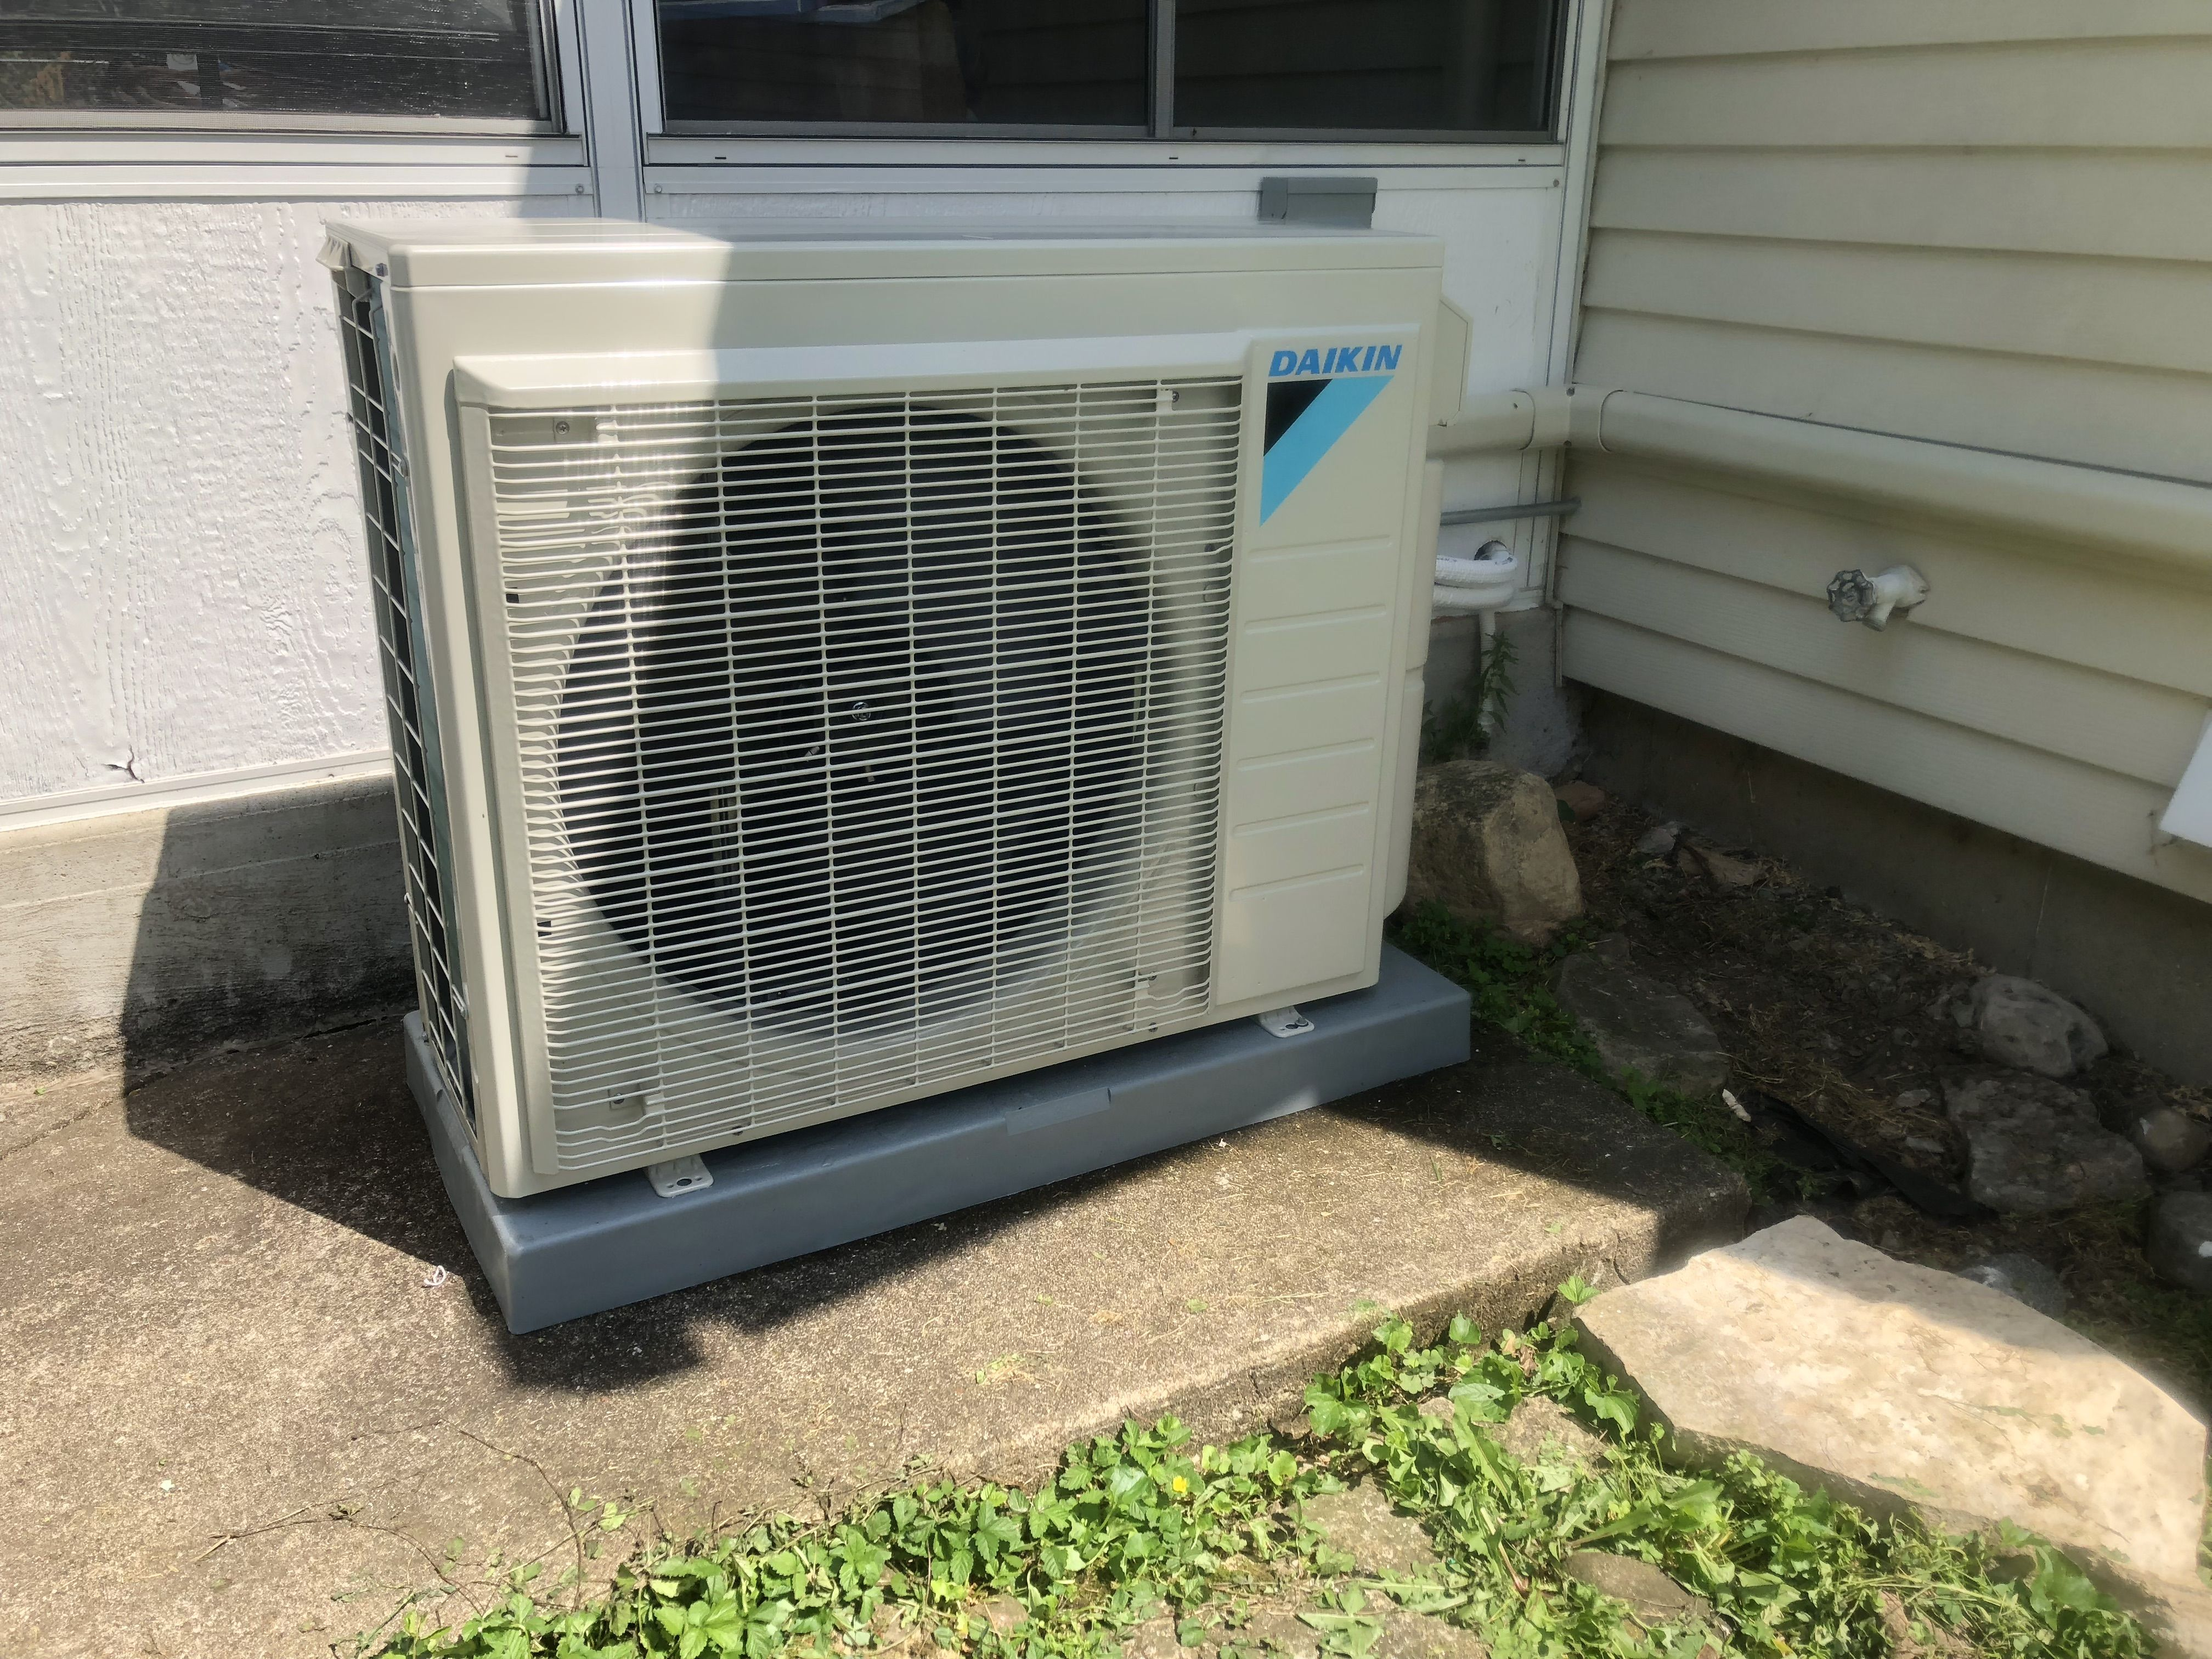 Daikin 2 Zone Ductless Heat Pump Adds Air Conditioning To A Boiler Heater Home Ductless Heat Pump Ductless Heating Ductless